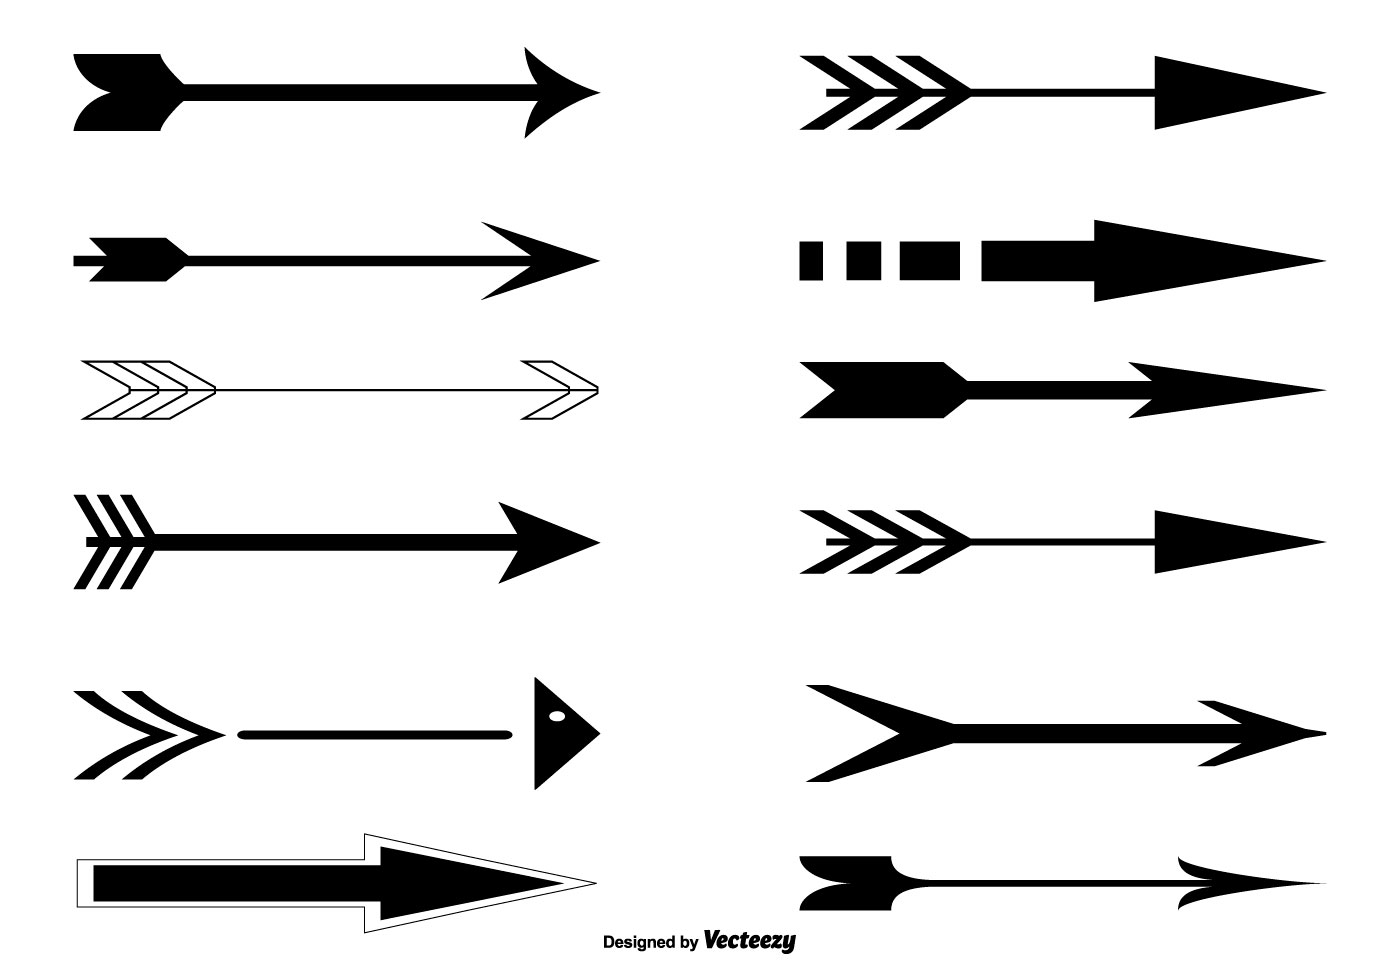 vector arrow set download free vector art  stock graphics   images Cute Arrow Vector Vintage Arrow Clip Art